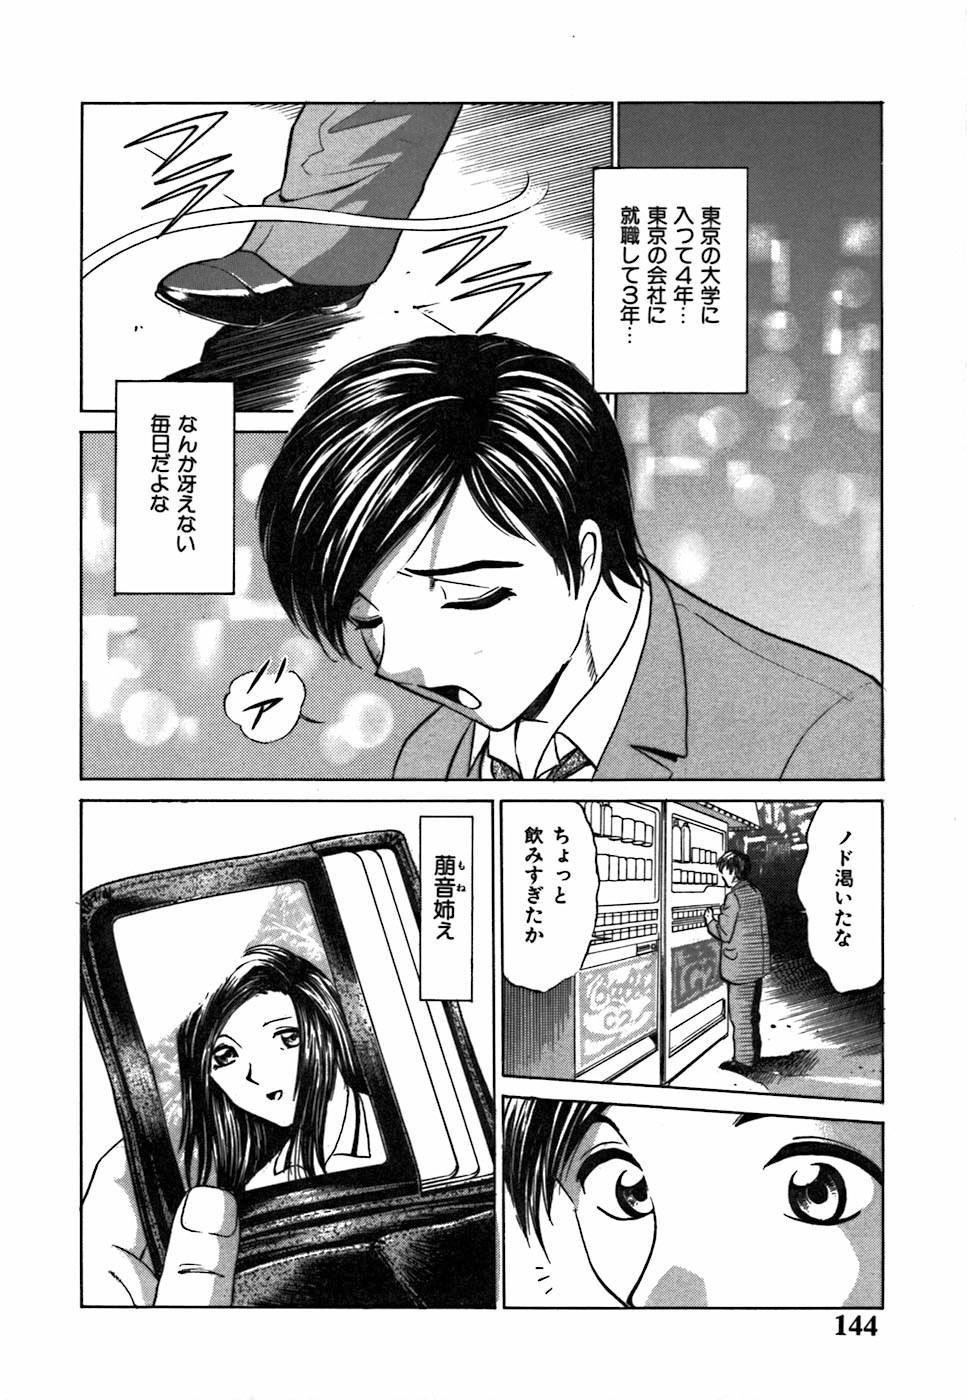 Kimi ga Nozomu Katachi | Appearance for which you hope 143